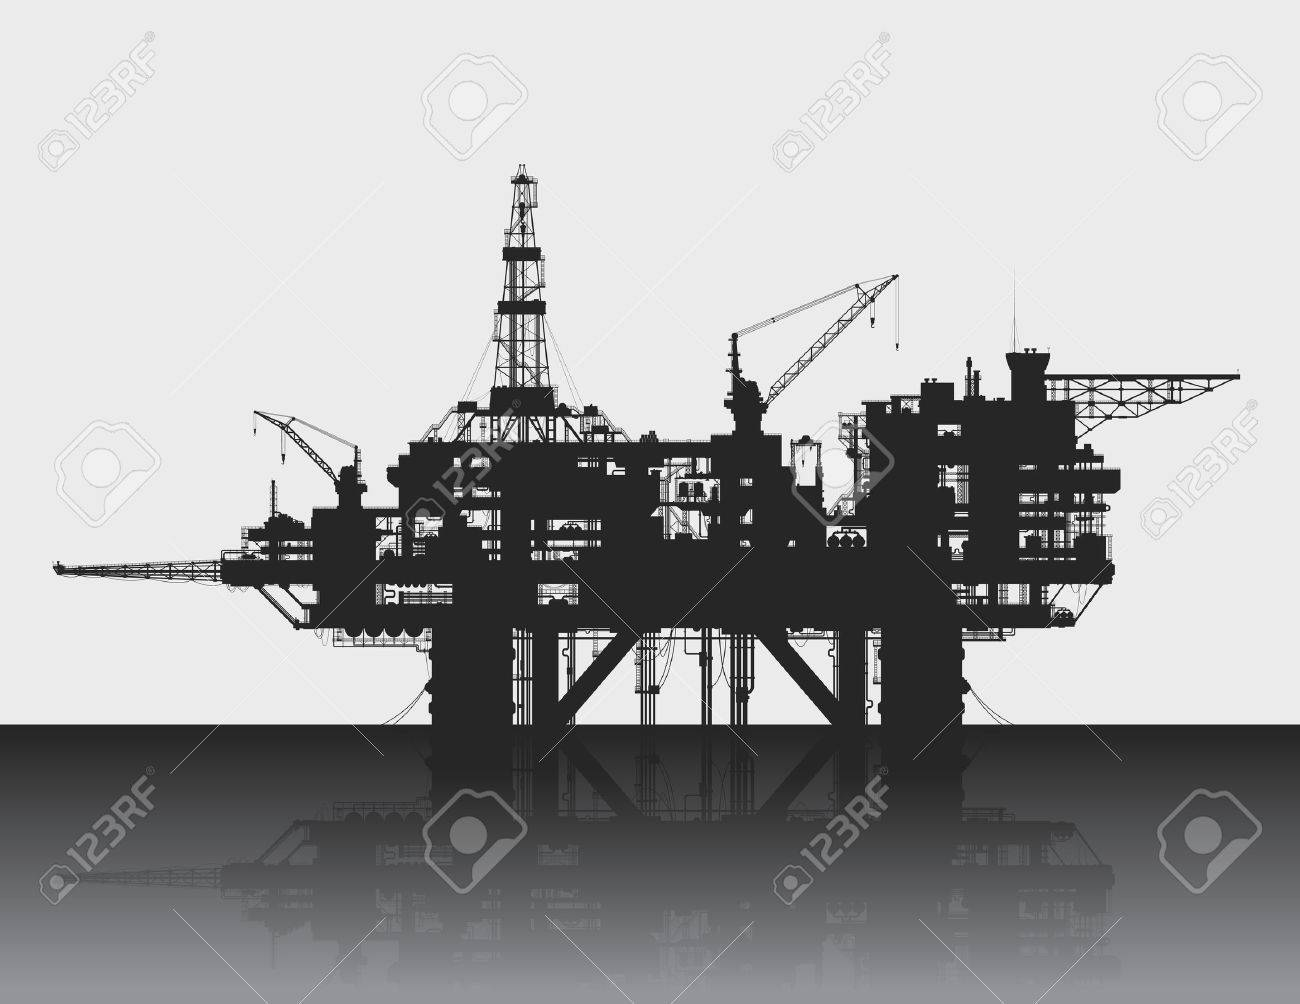 Sea oil rig. Oil platform in the deep sea. Detailed vector illustration. - 33102699